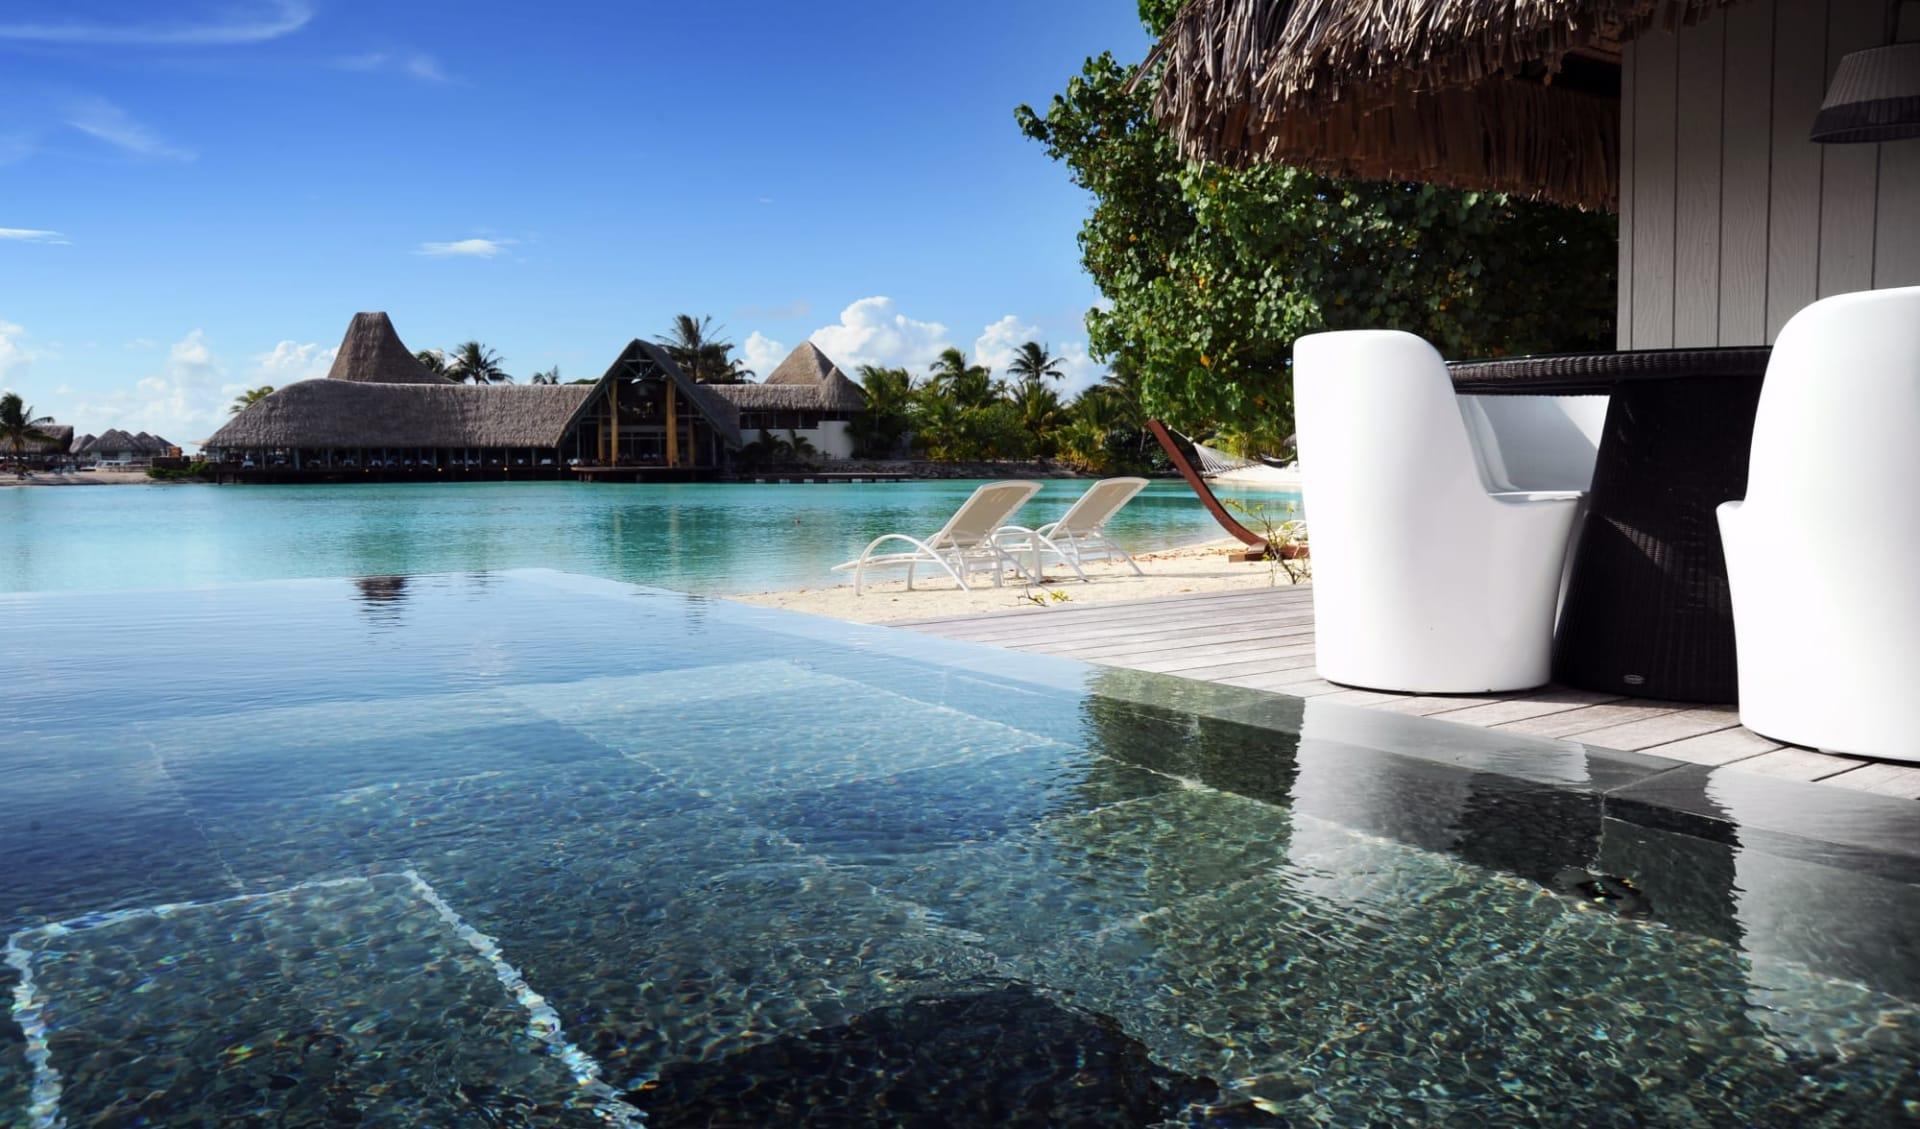 Le Méridien Bora Bora:  BOB Le Meridien - Beach Villa & Suite